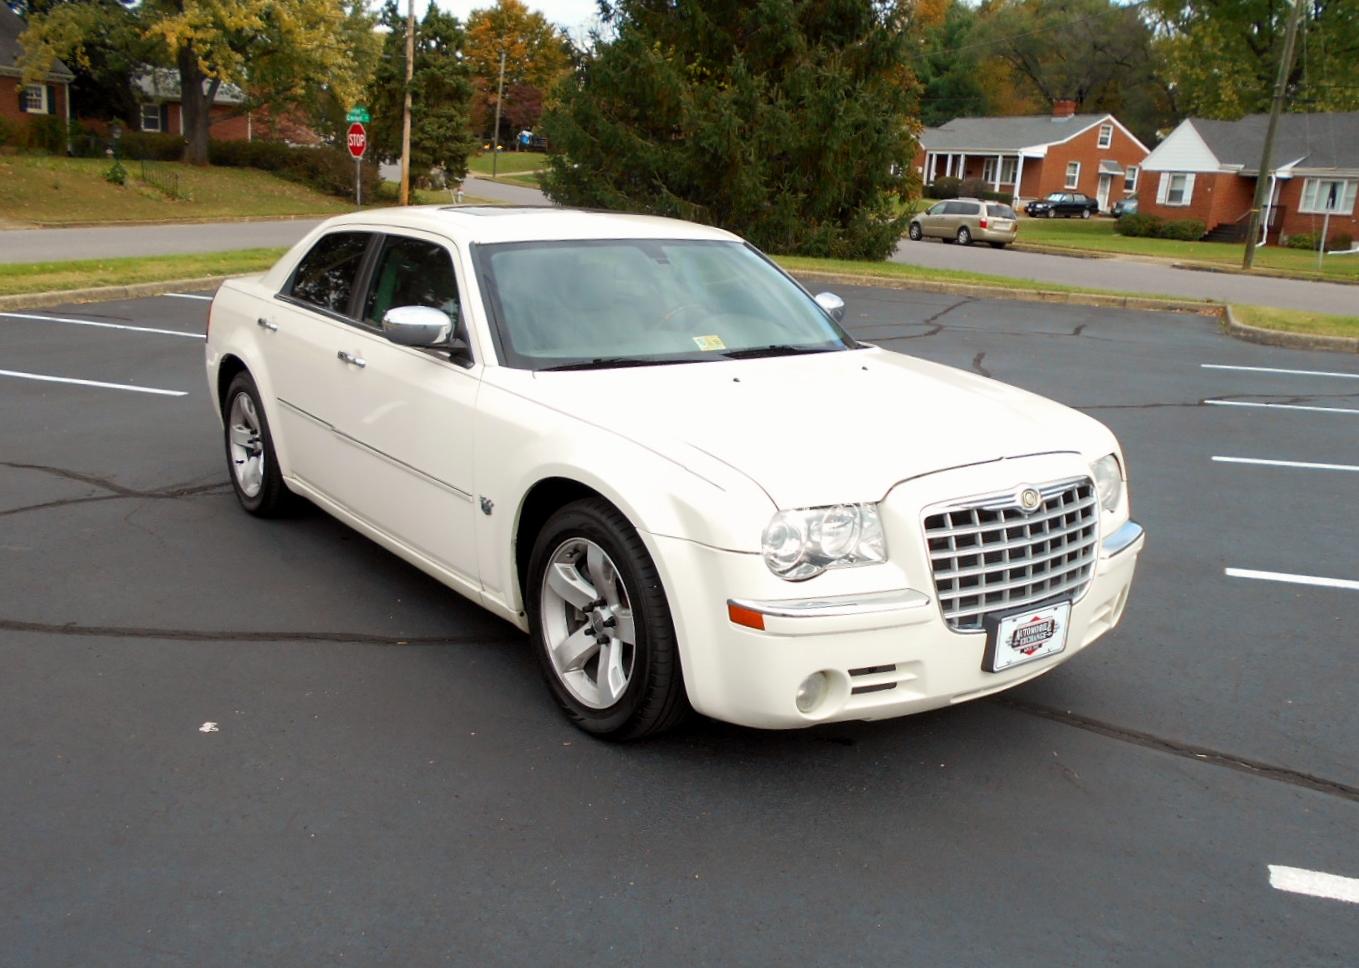 2007 chrysler 300c hemi 005 2007 chrysler 300c hemi 005 automobile exchange. Black Bedroom Furniture Sets. Home Design Ideas